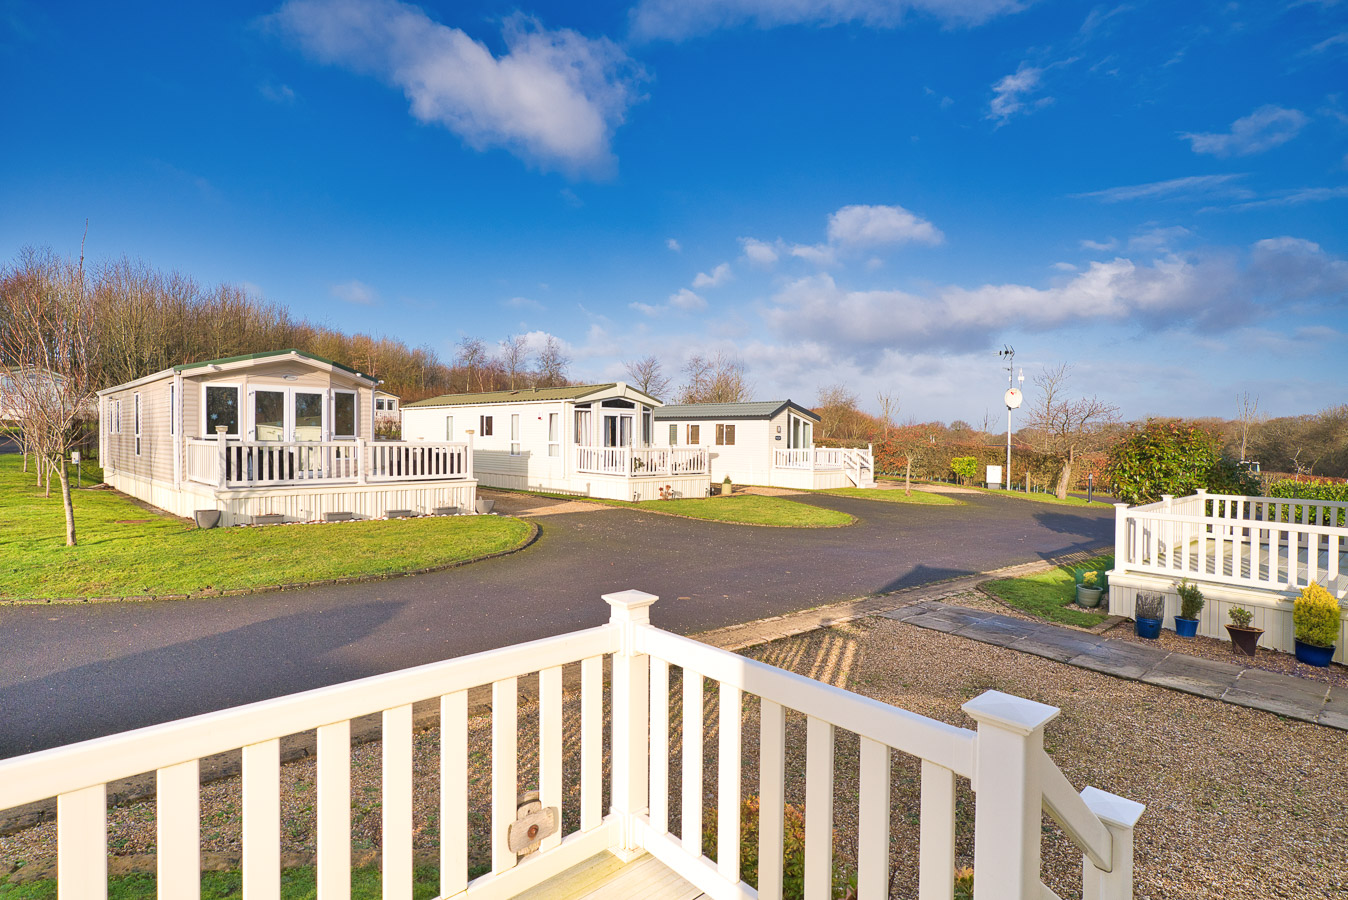 Best-Holiday-Static-Caravan-Sale-Charmouth-Lyme-Regis-Monkton-Wyld-5